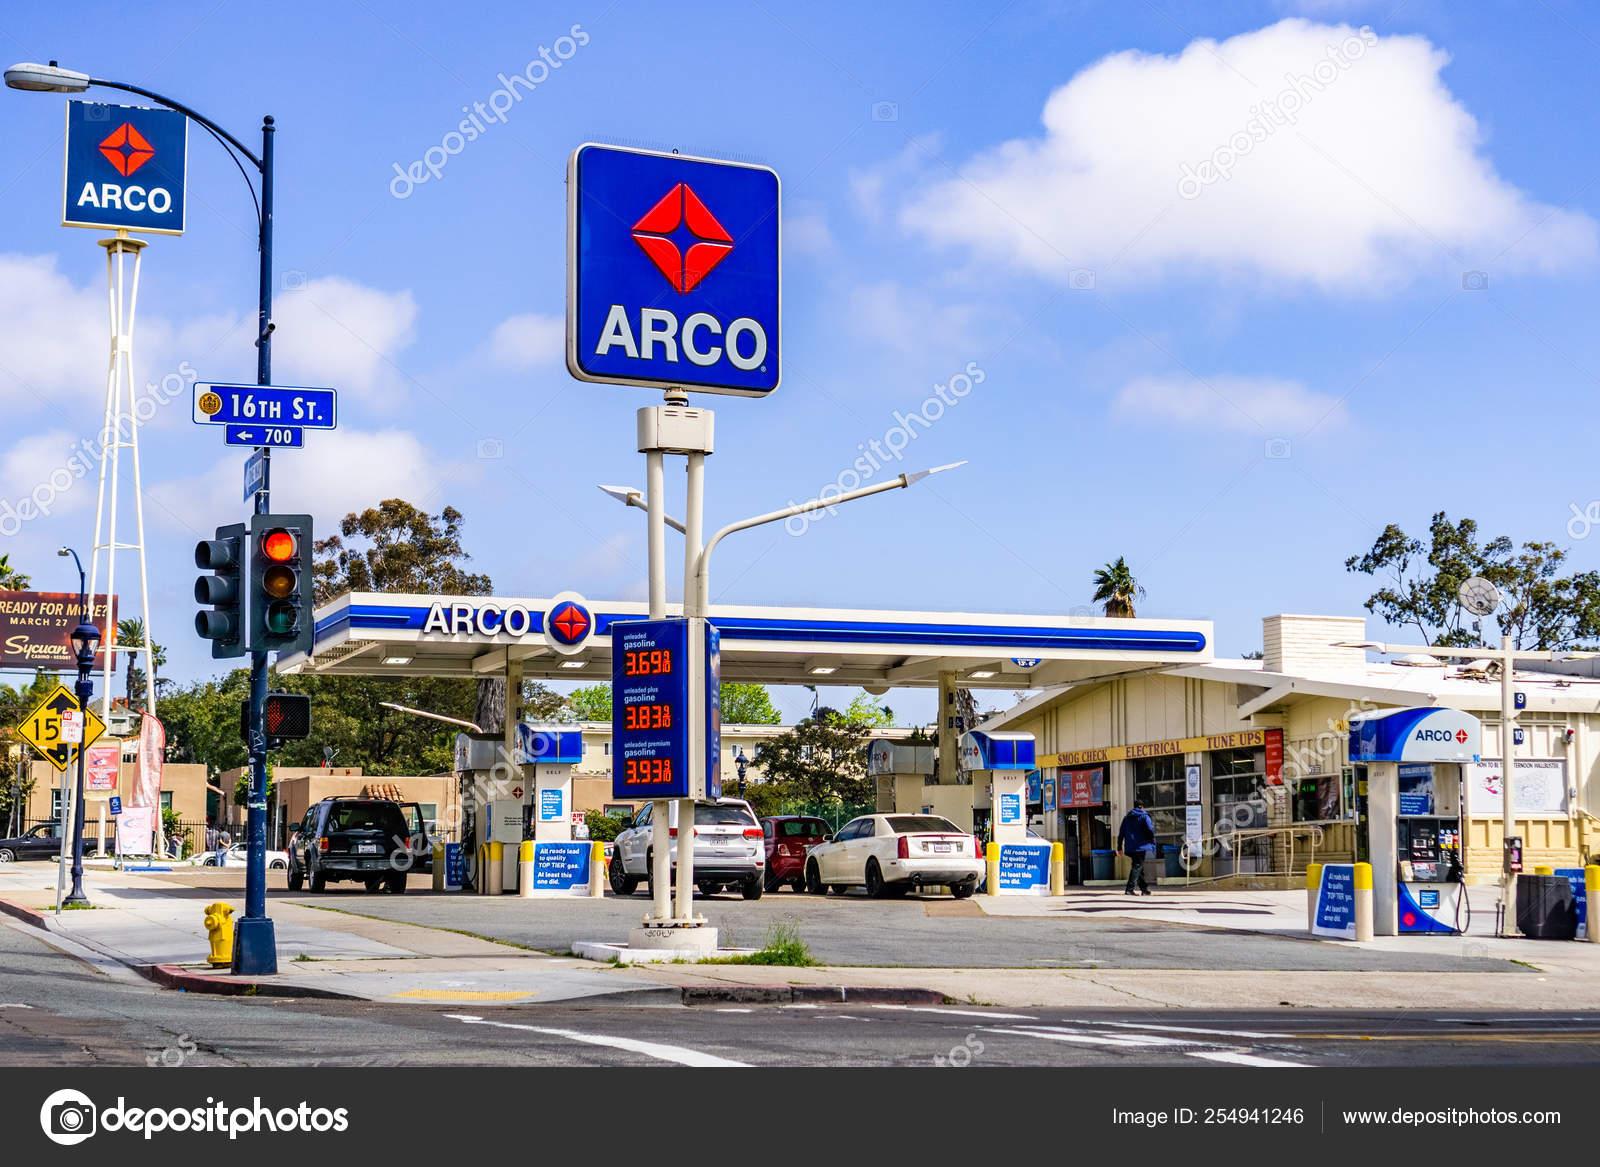 Arco Gas Station >> March 19 2019 San Diego Ca Usa Arco Gas Station